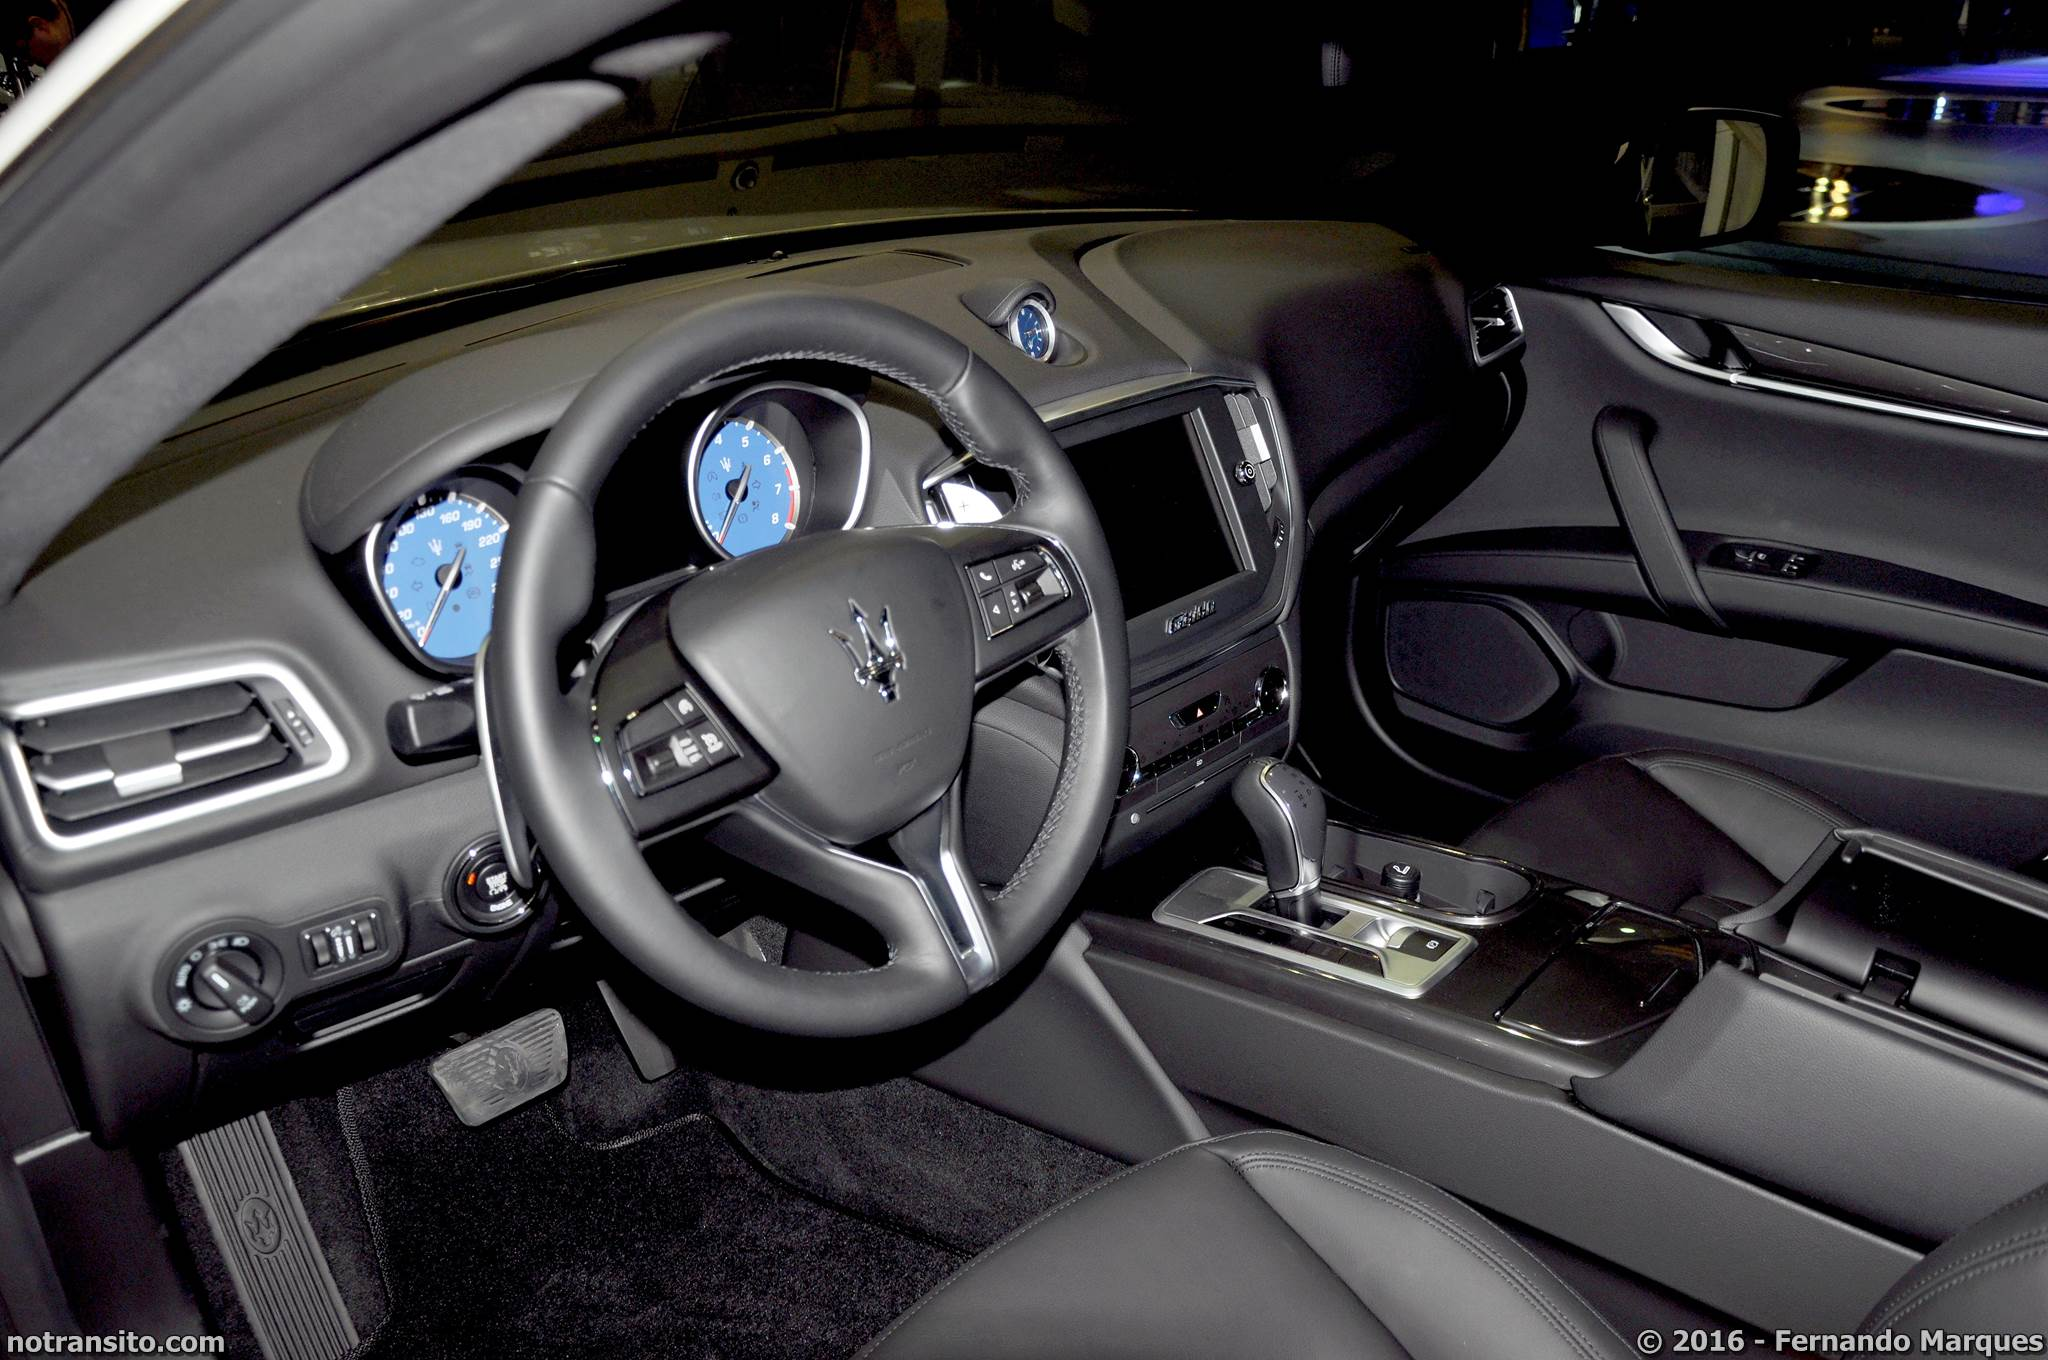 Maserati Ghibli Salão do Automóvel 2016